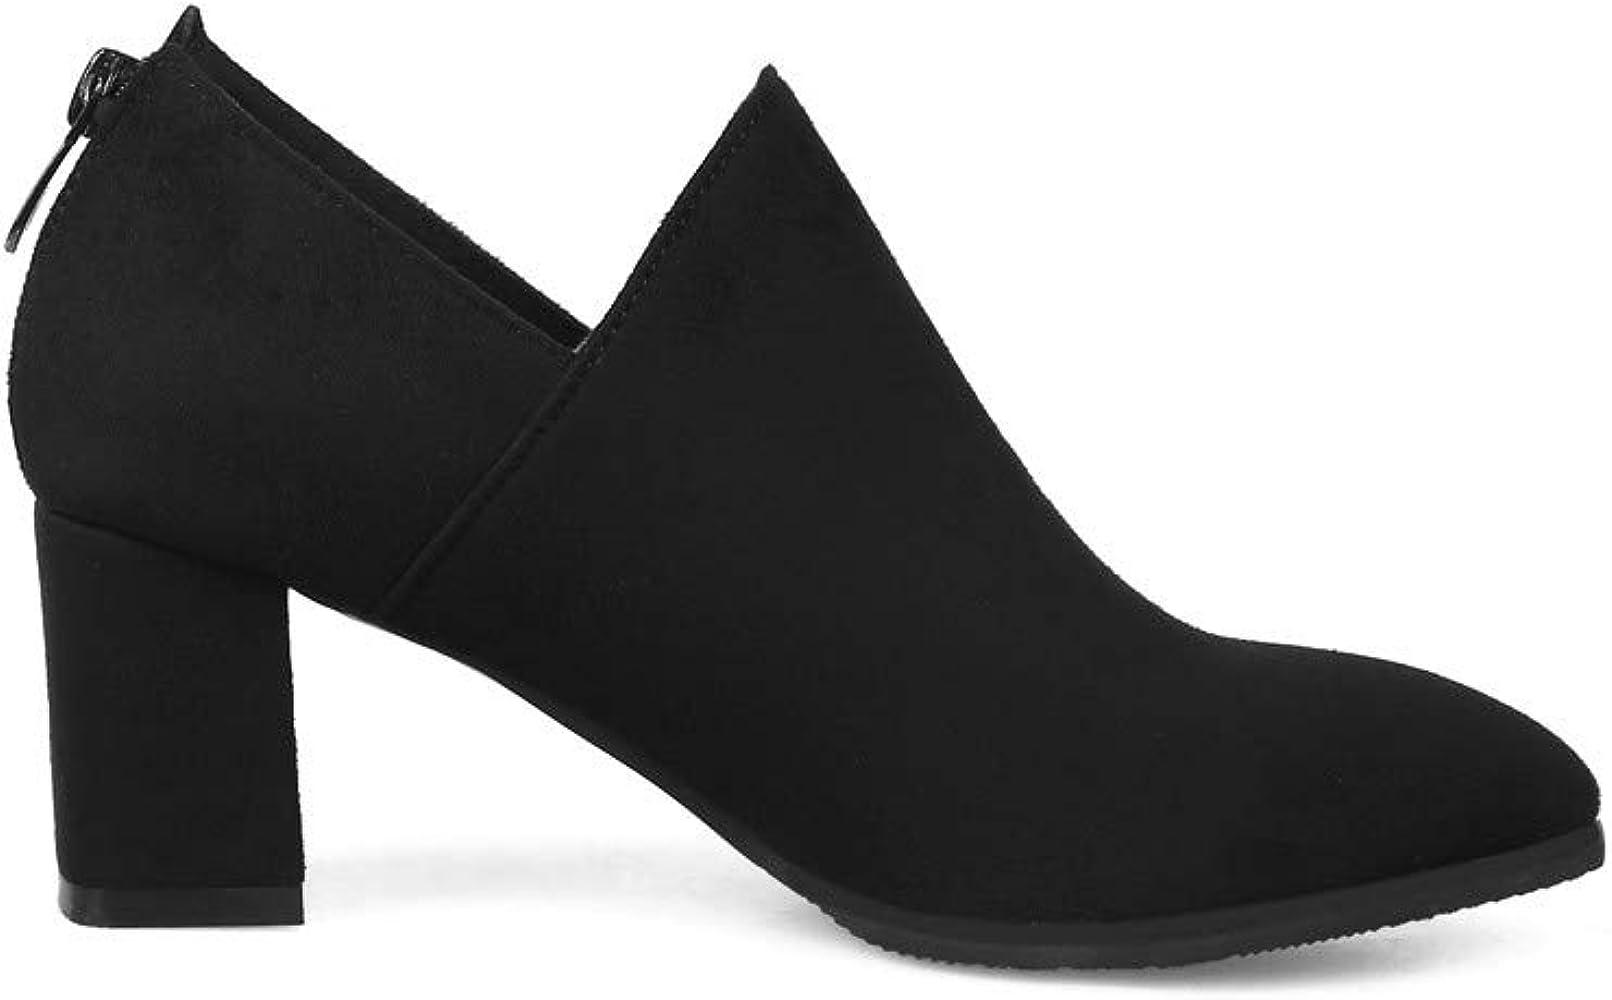 〓 YUTING 〓 Botas Cortas de tacón Alto de Moda para Mujer ...